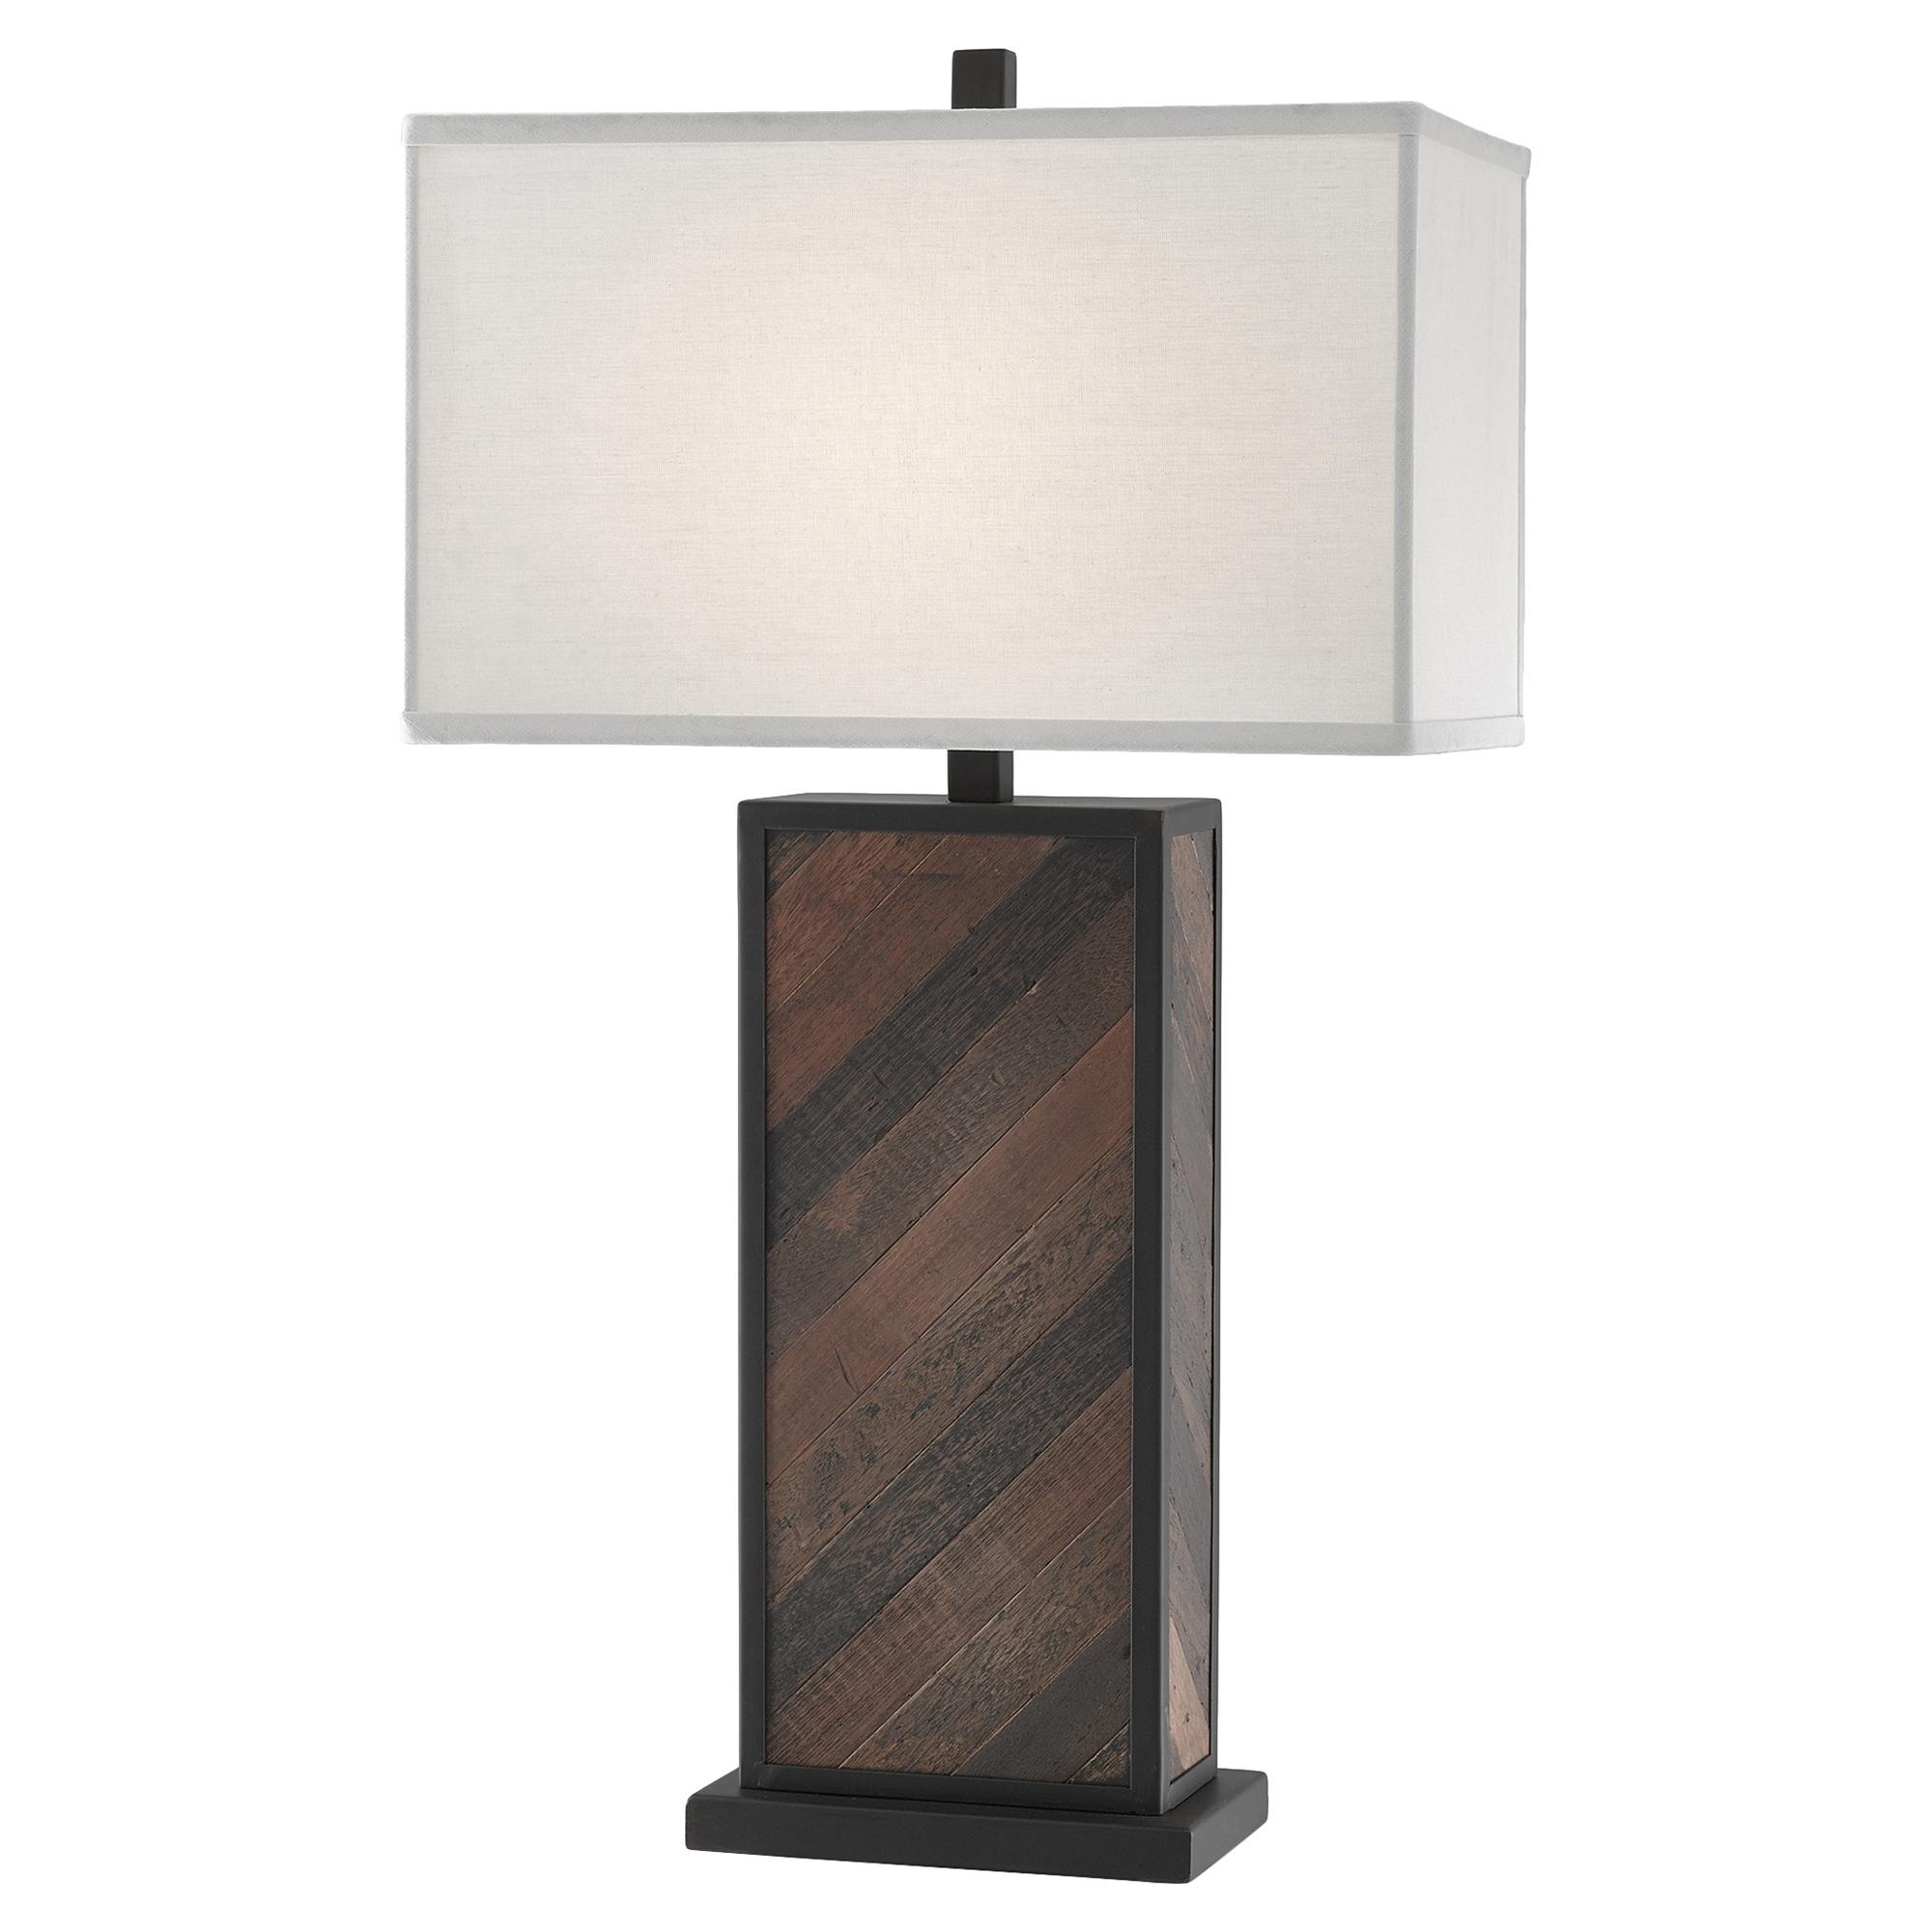 Keelan Rustic Lodge Striped Wood Table Lamp